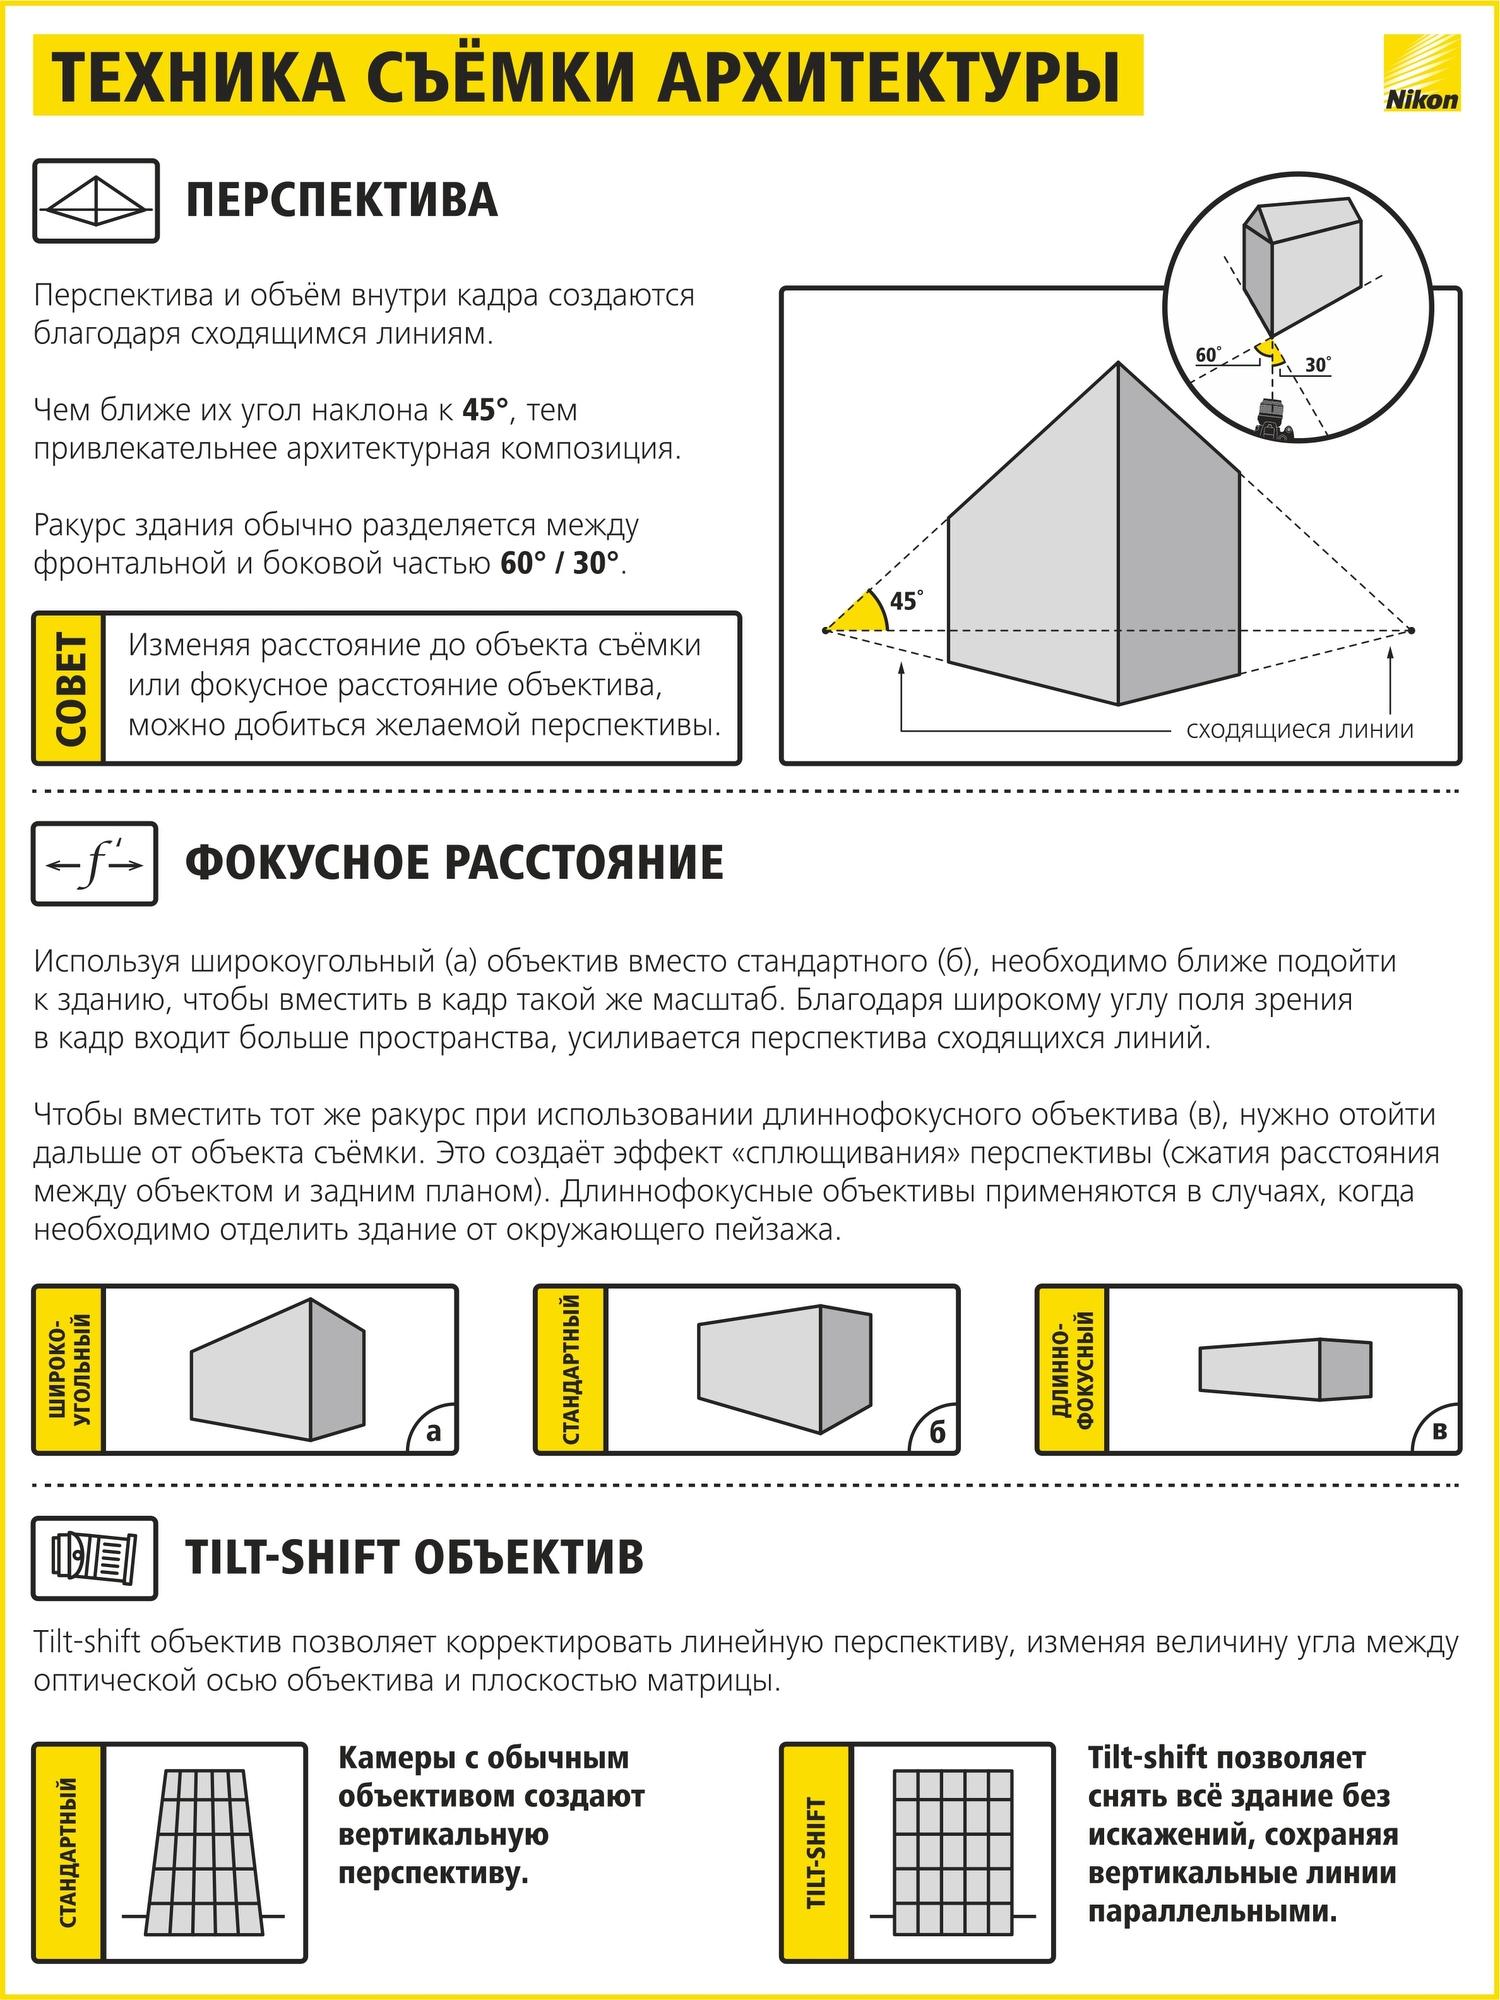 http://bigpicture.ru/wp-content/uploads/2015/04/info_nikon_16.jpg